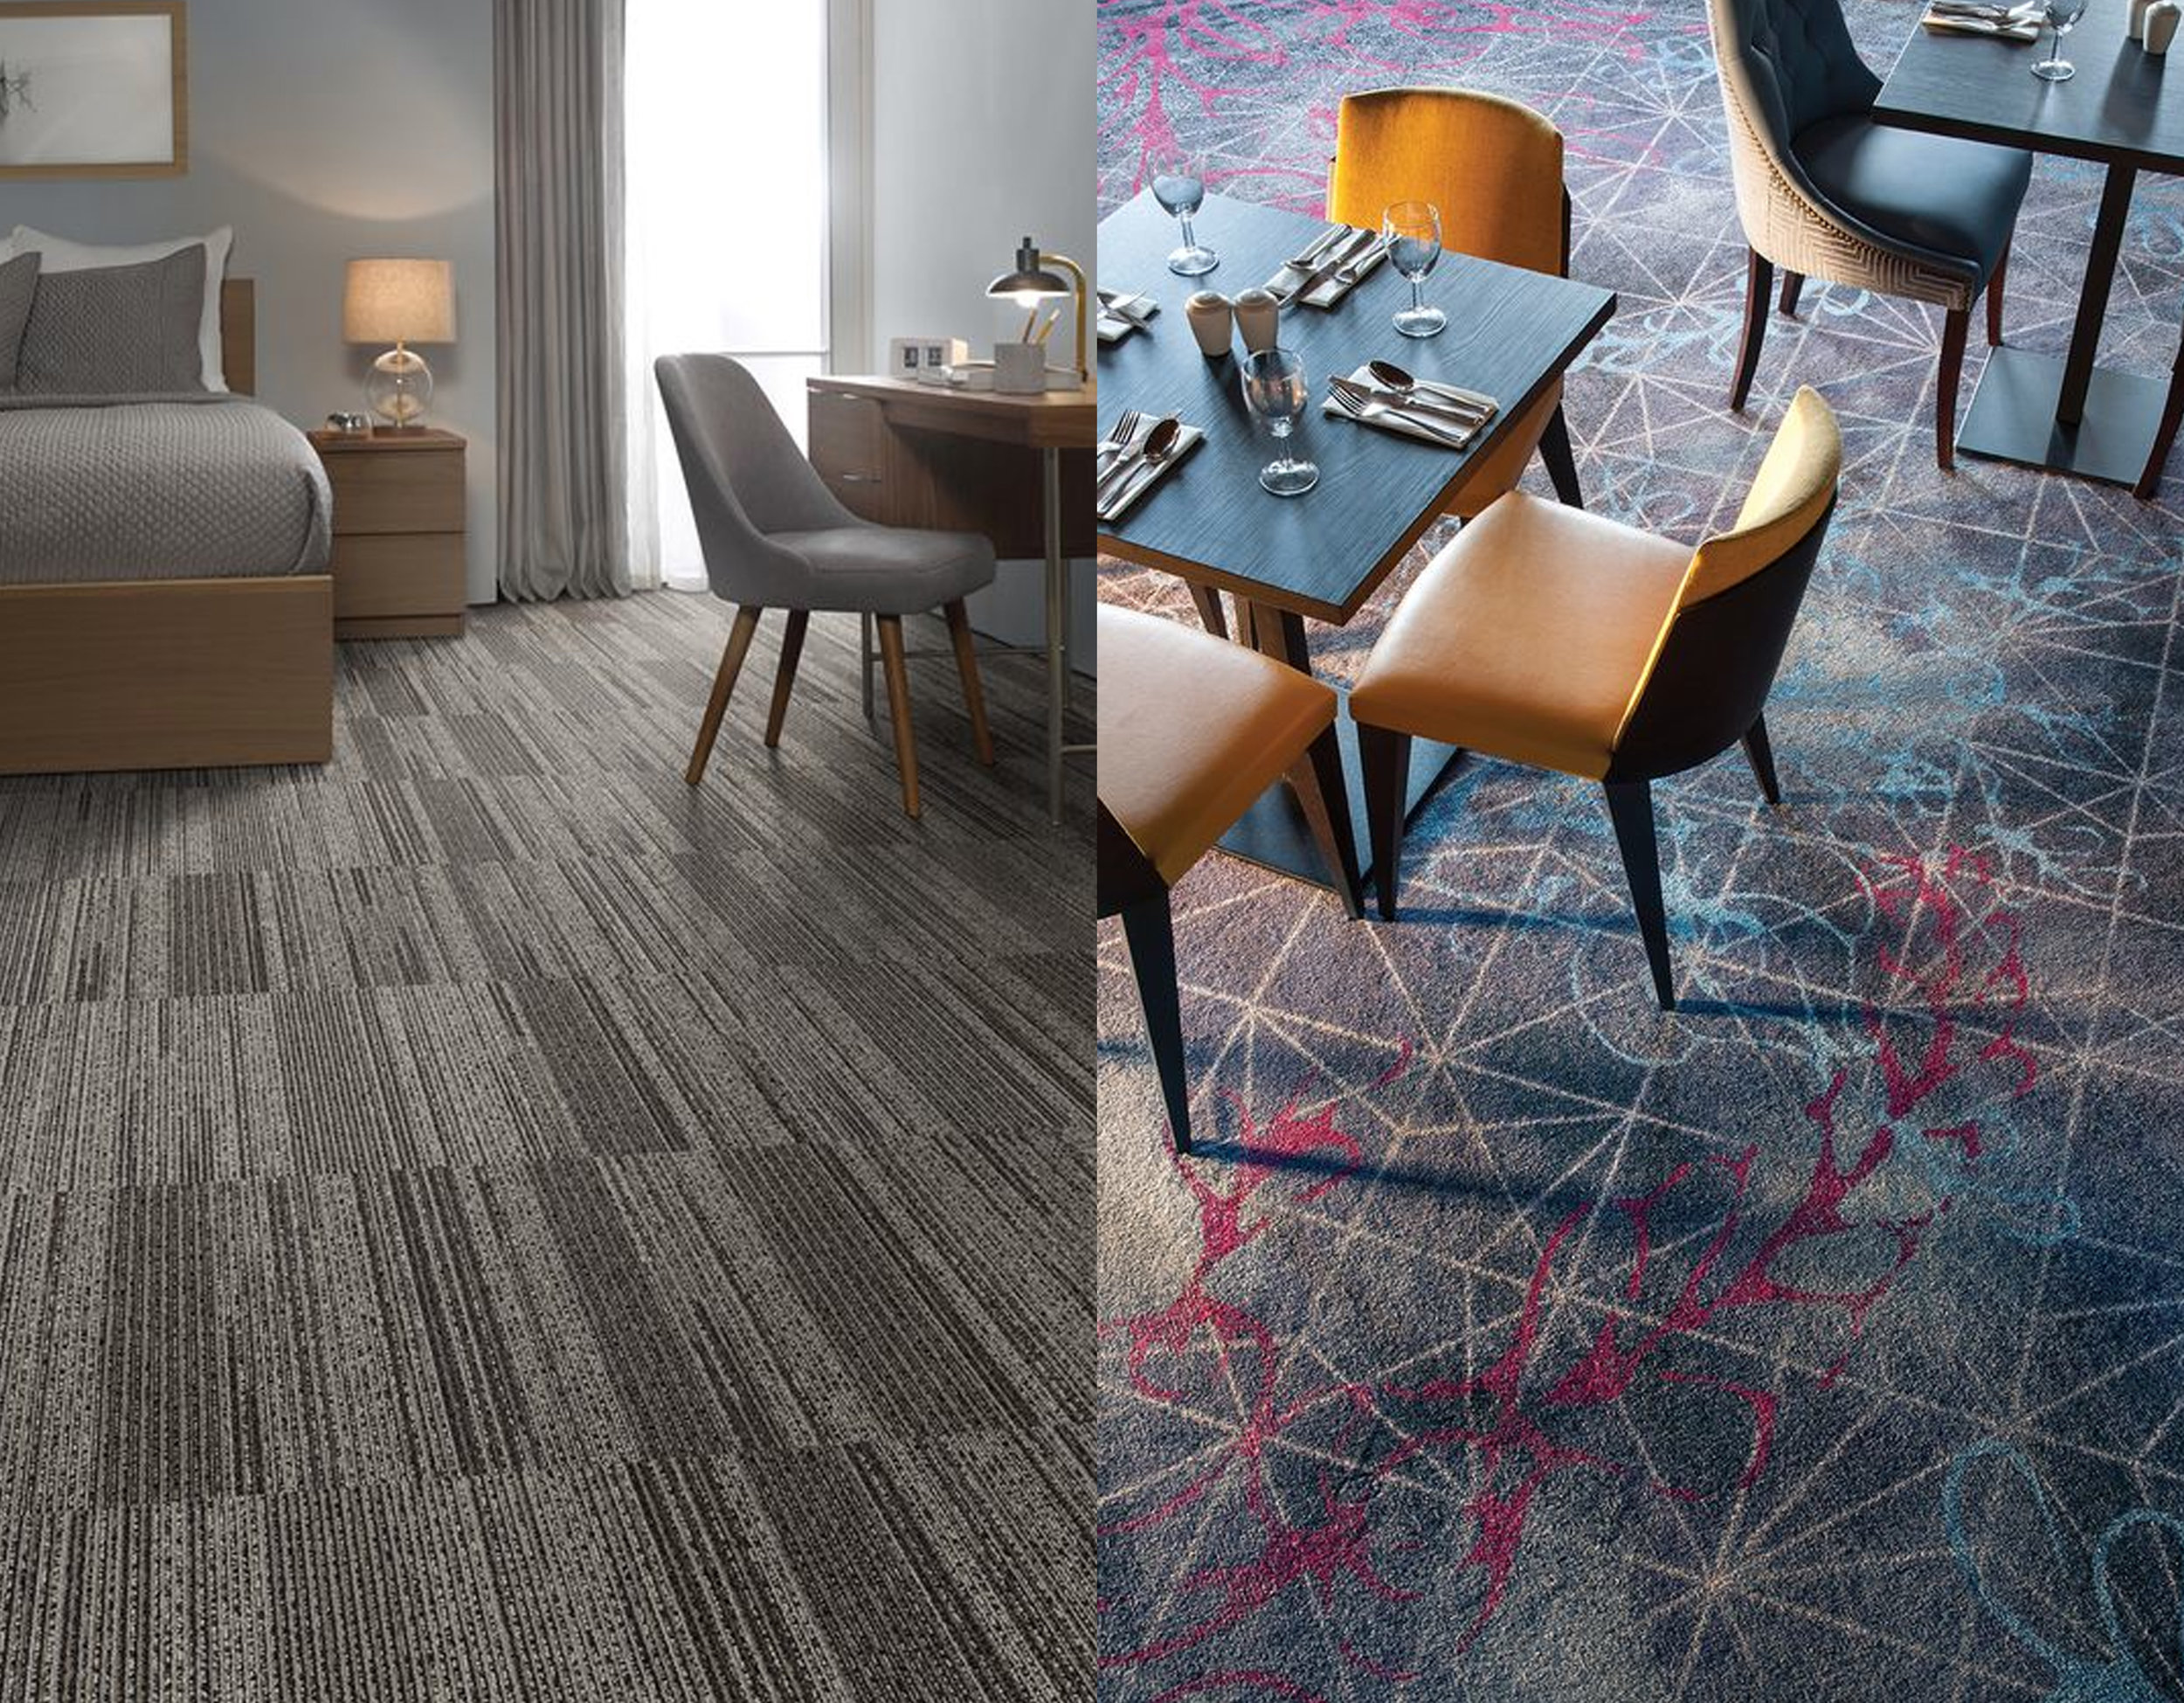 Durkan  hospitality carpet -  Ulste r hospitality carpet